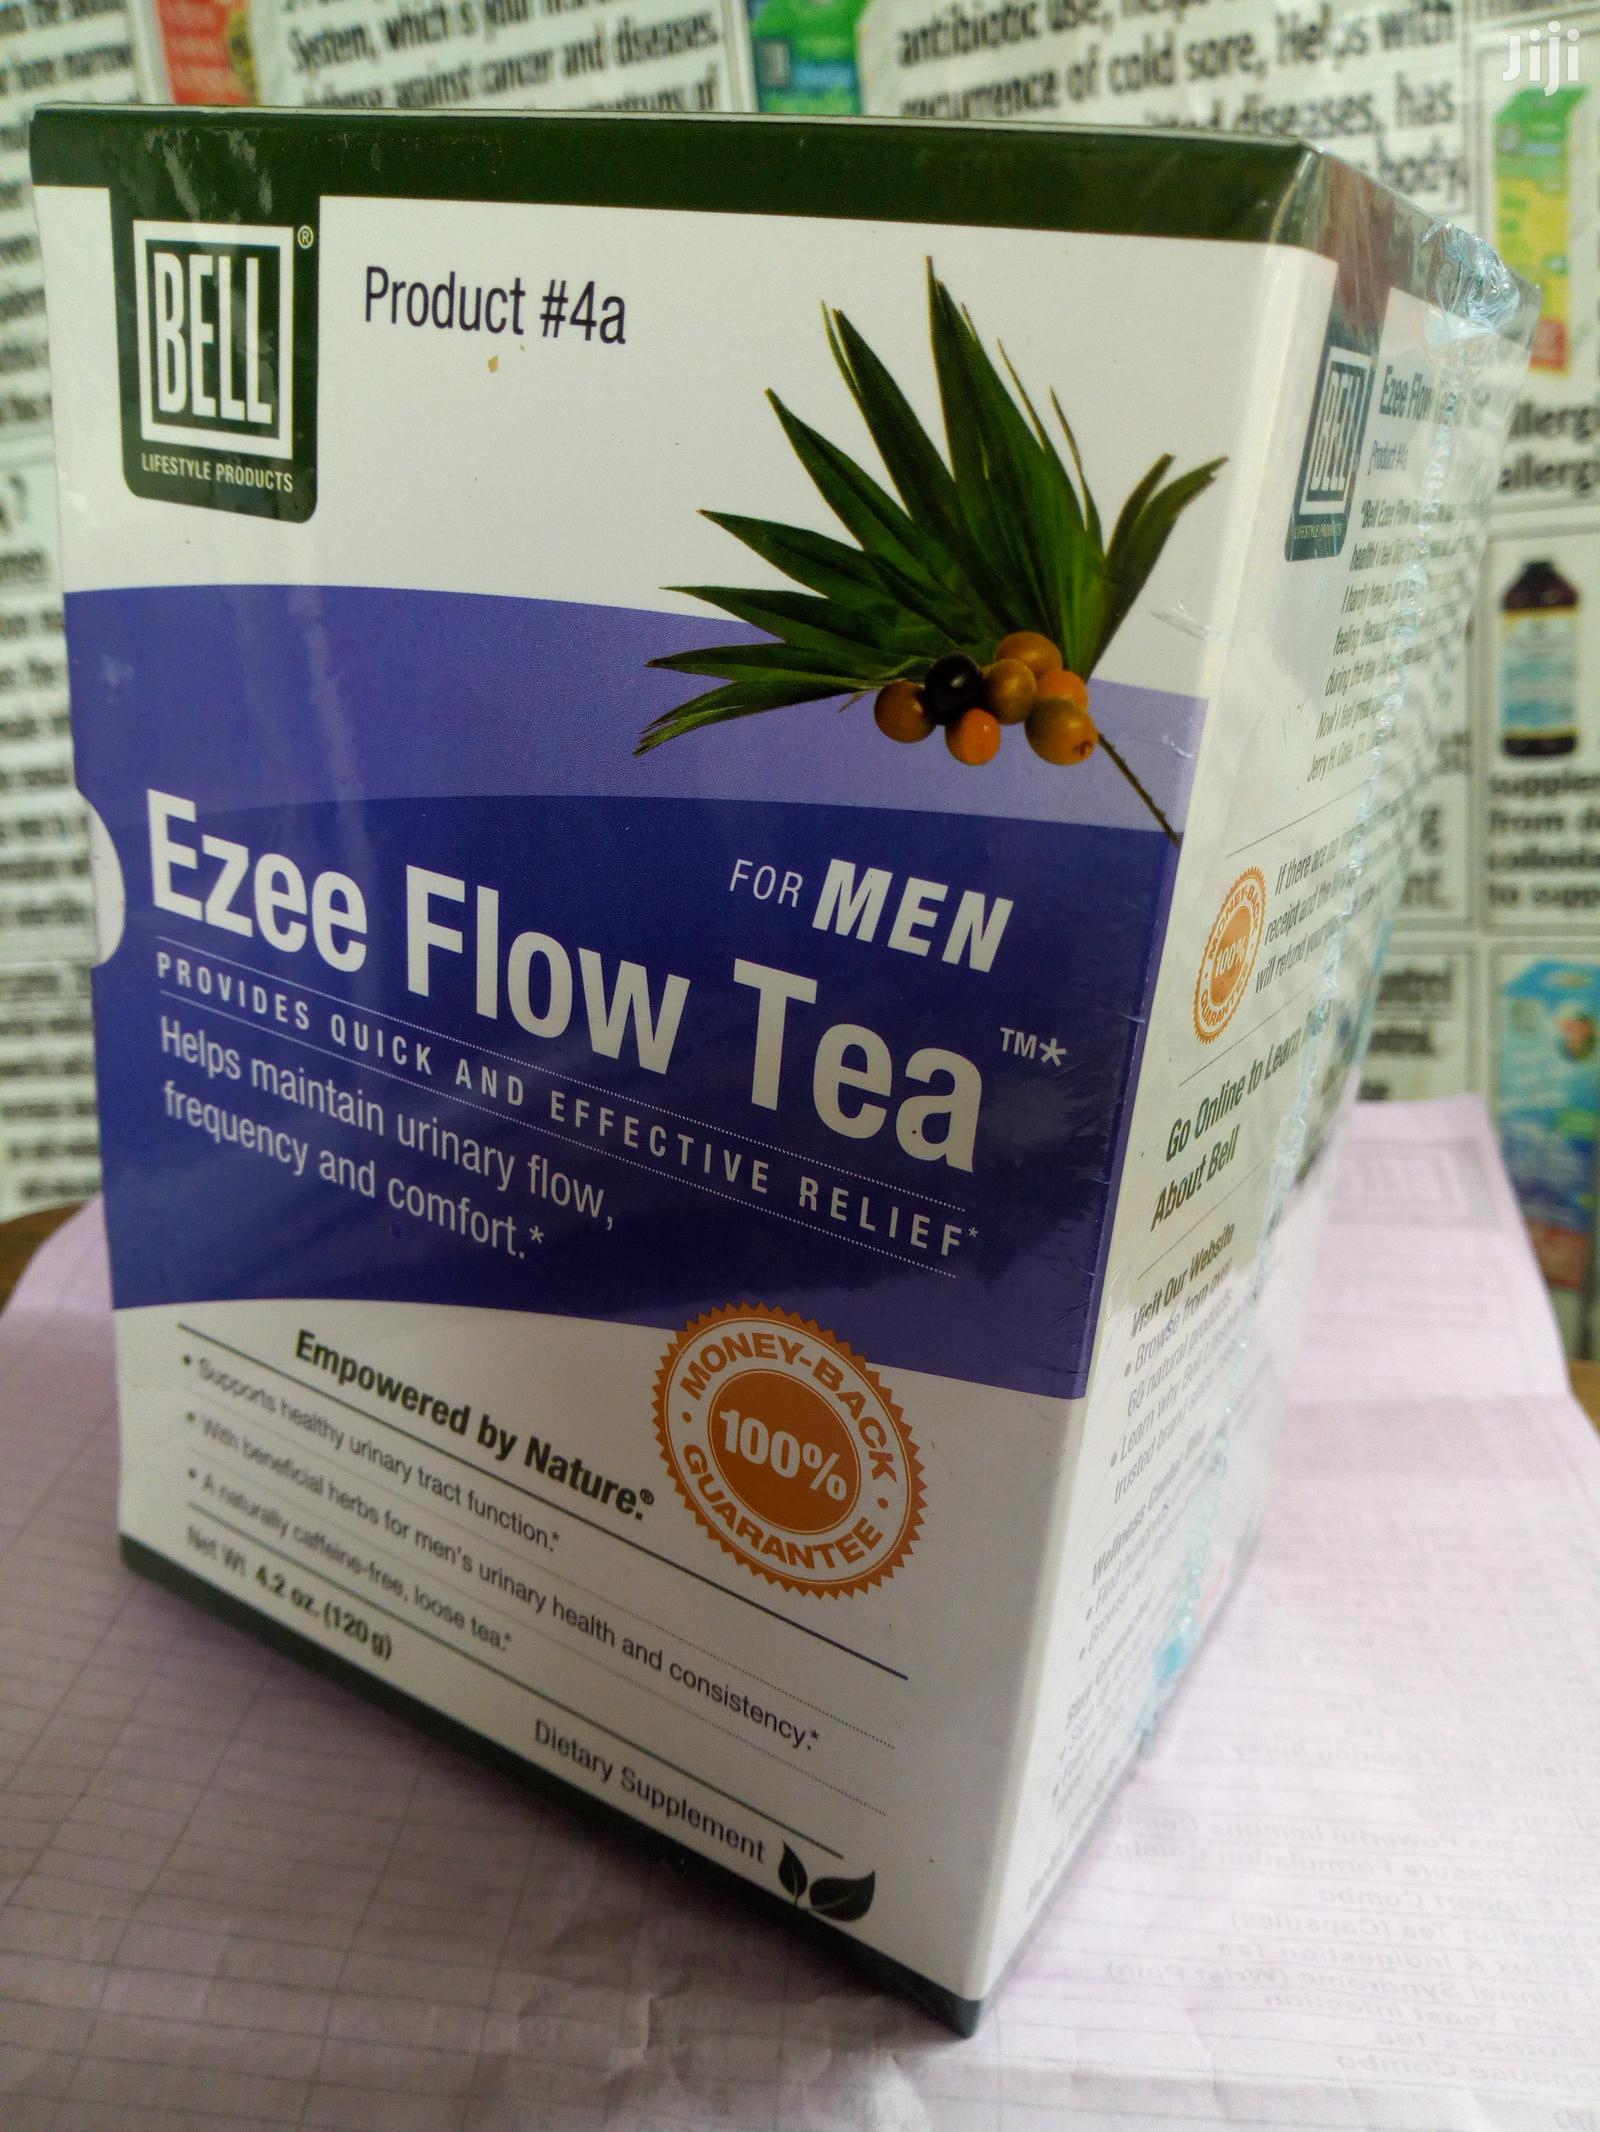 Ezea Flow Treats Frequent Urination, Stop Prostate Enlargement